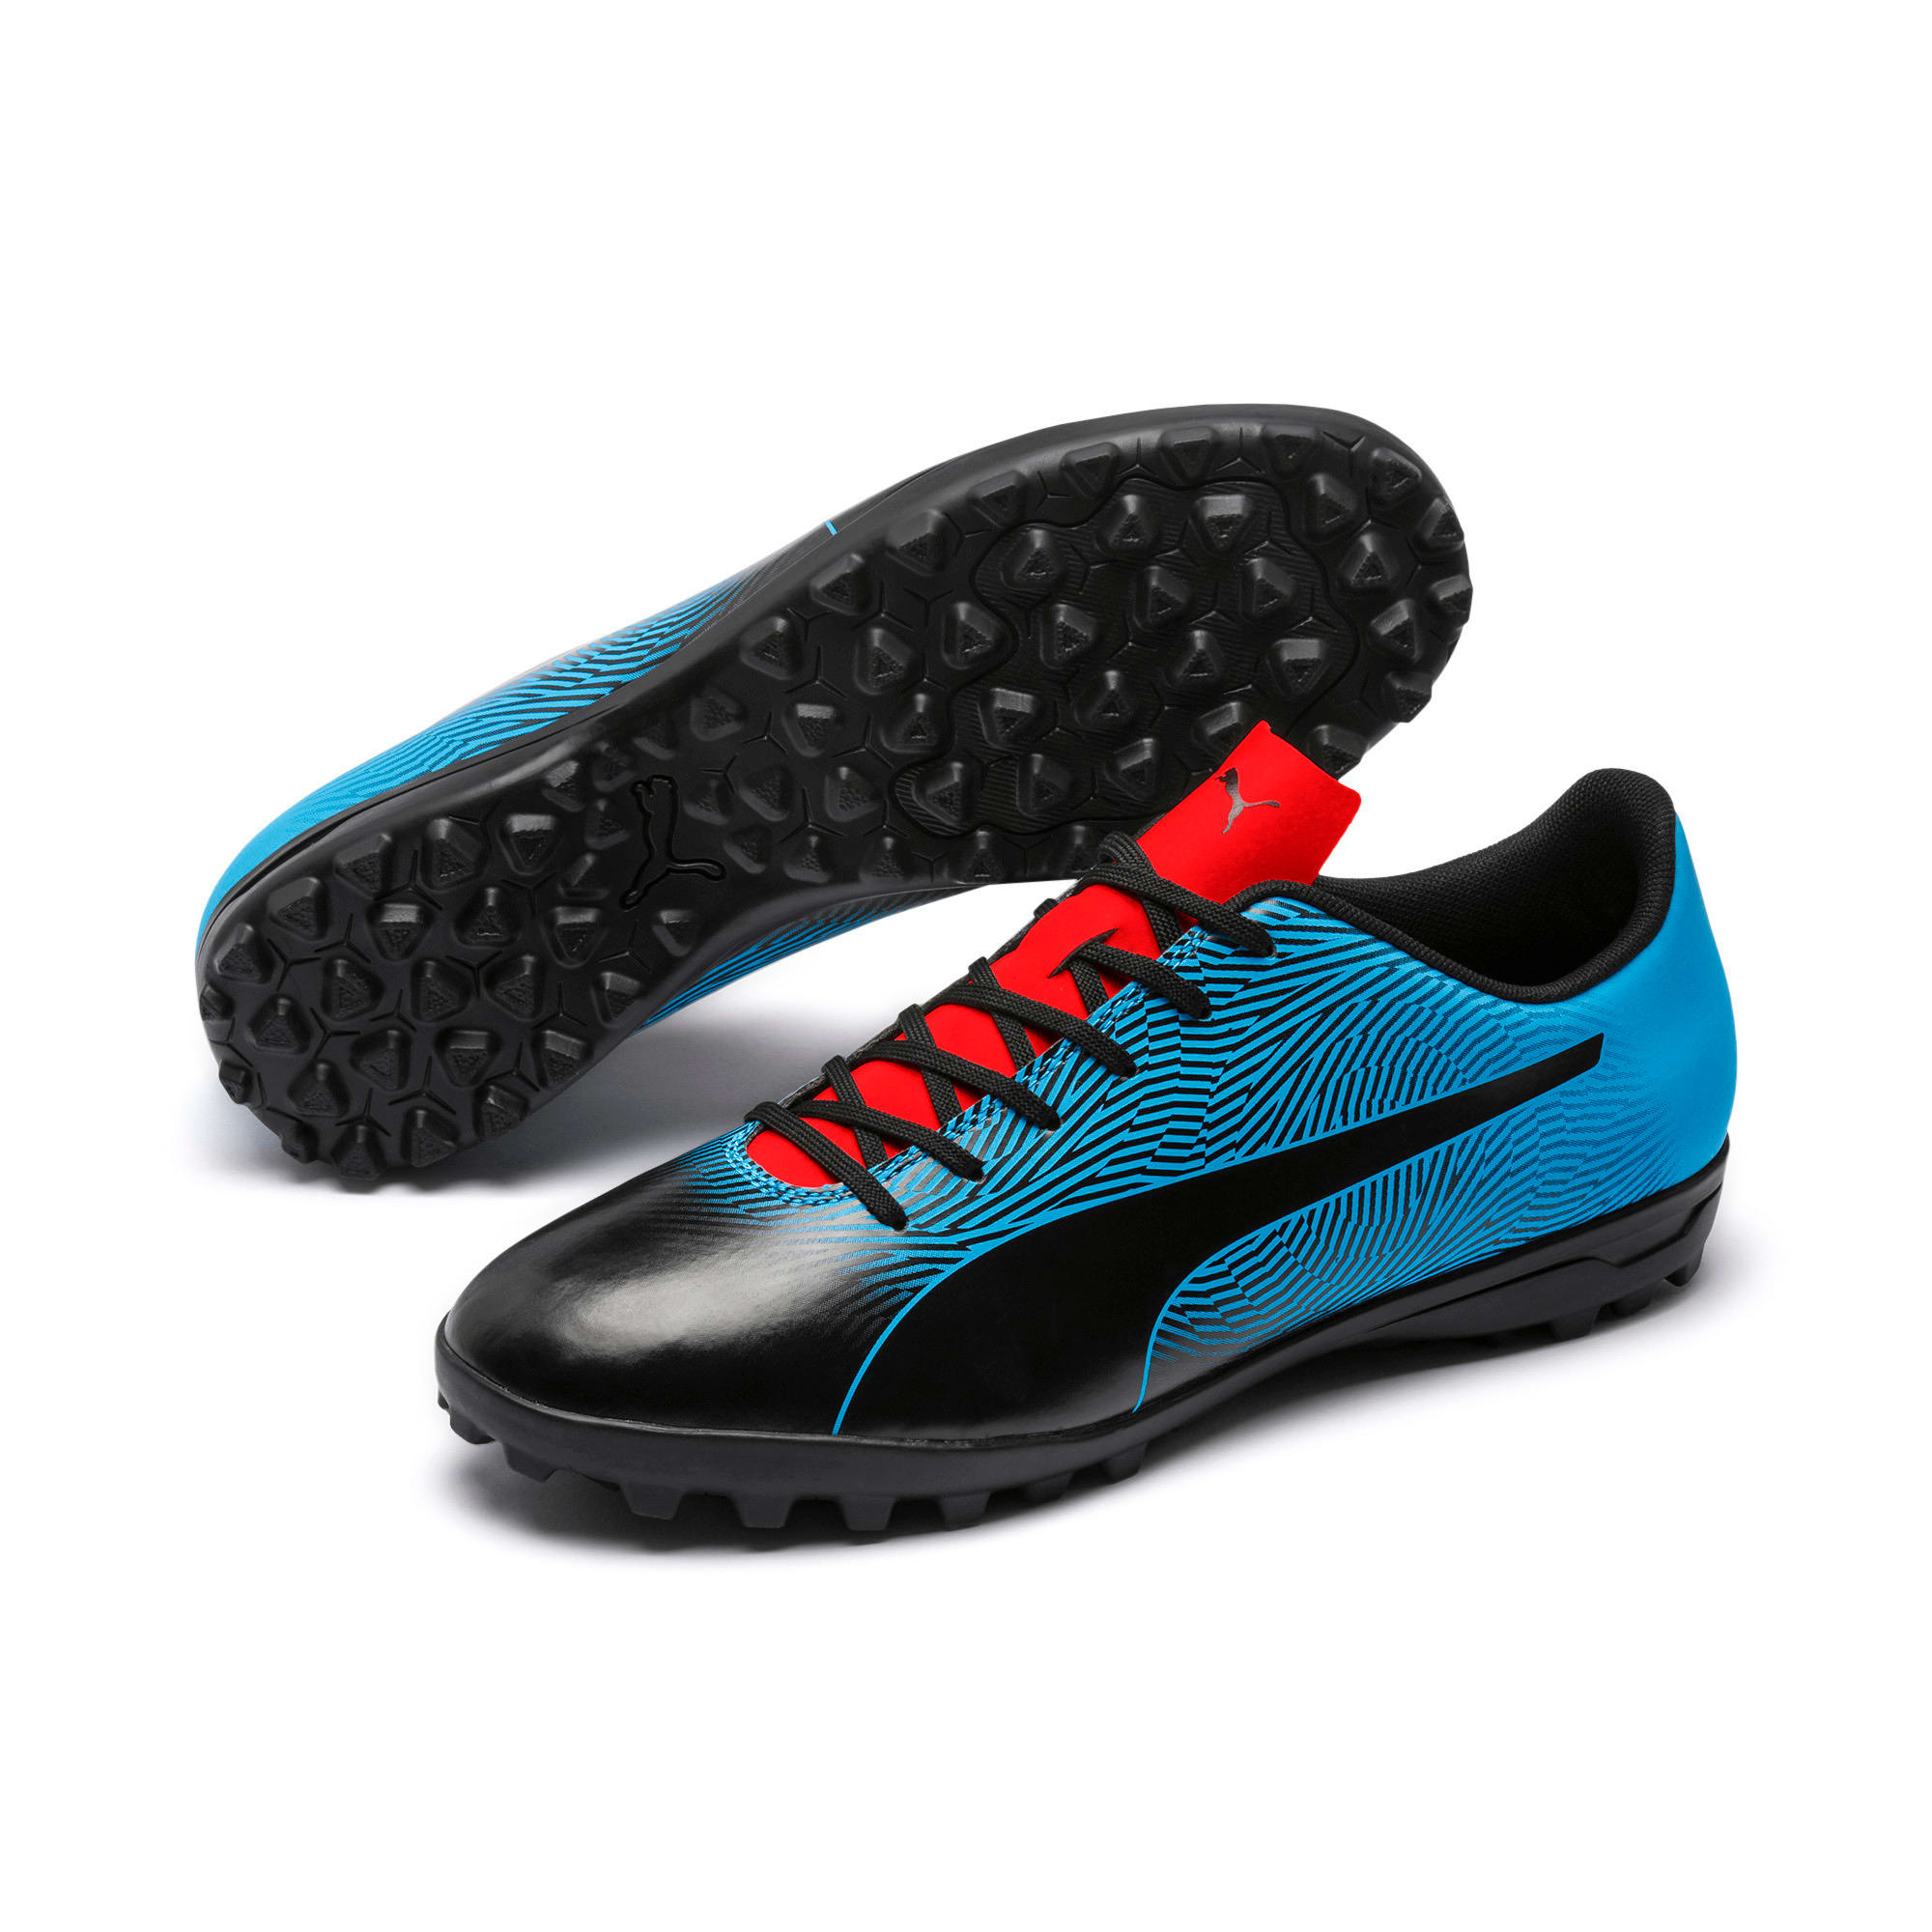 Thumbnail 2 of PUMA Spirit II TT Men's Soccer Shoes, Black-Bleu Azur-Red Blast, medium